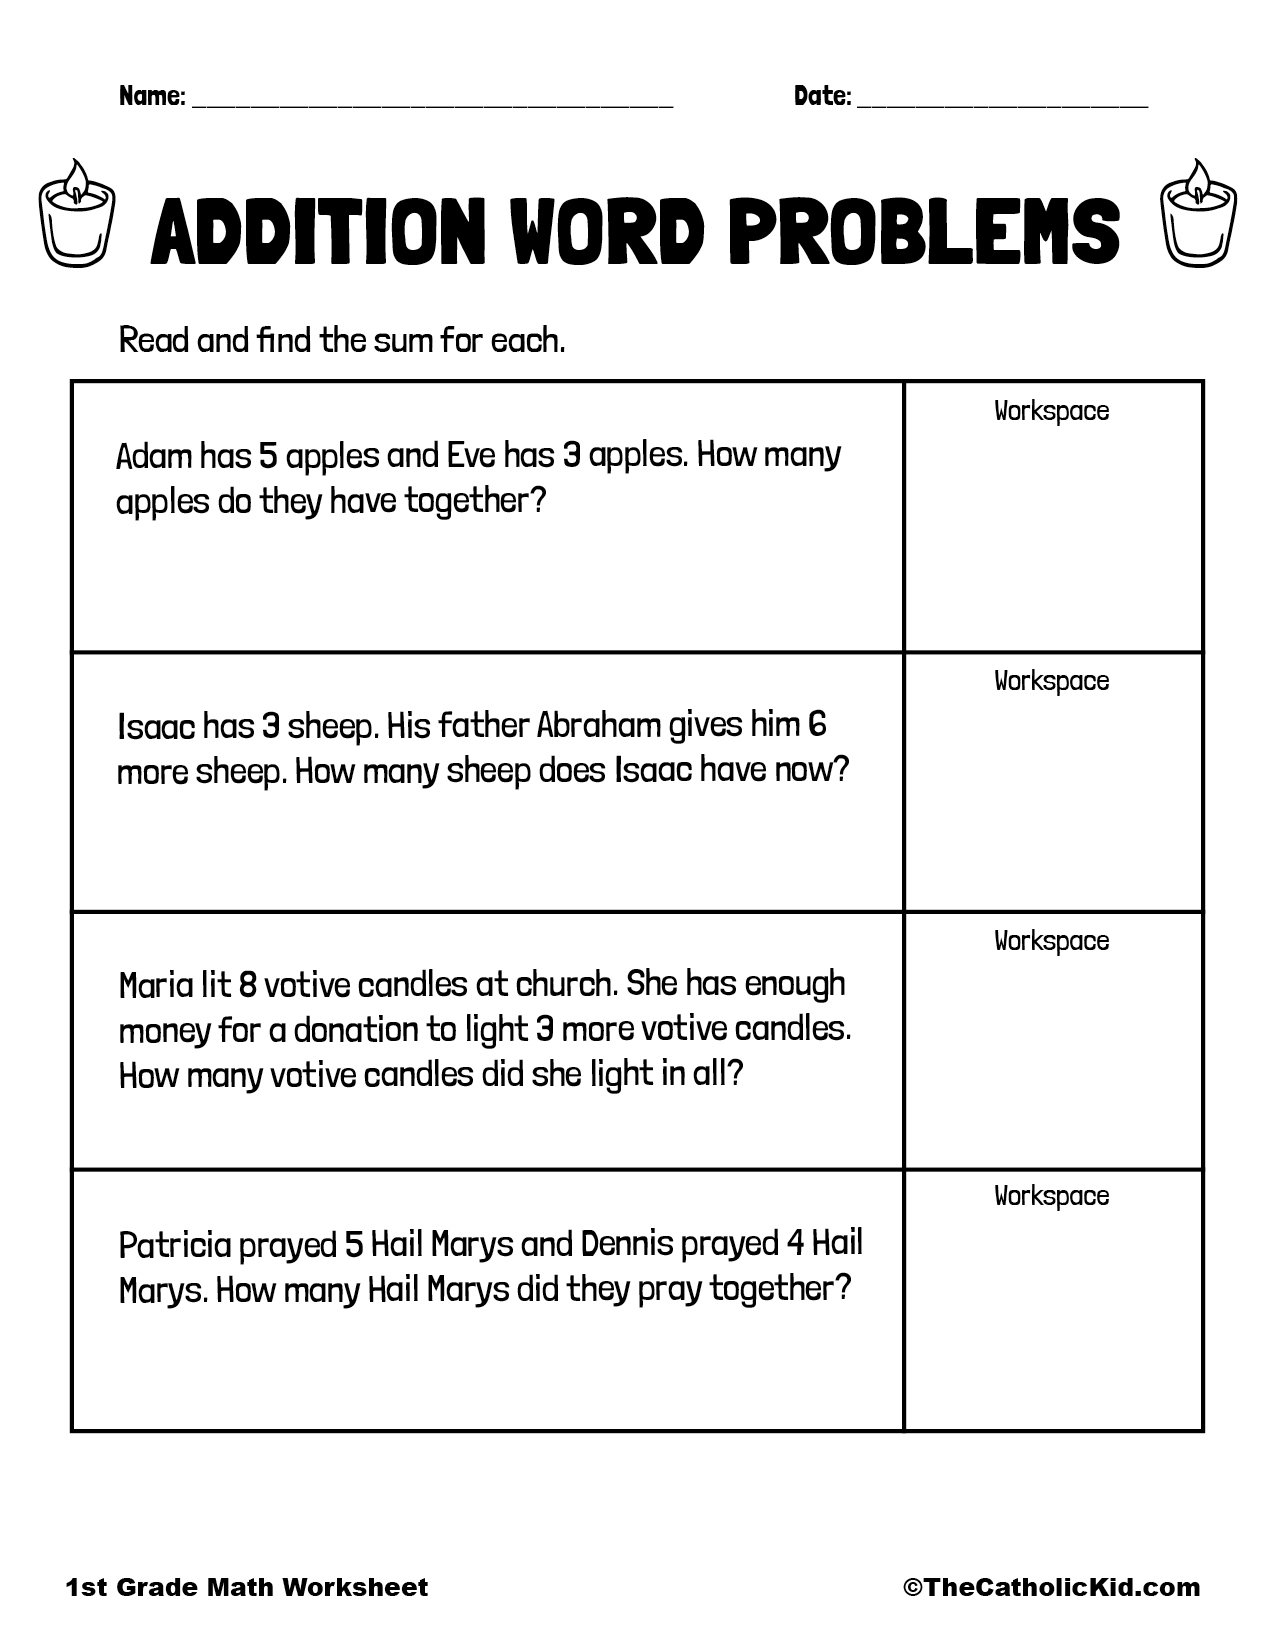 Addition Word & Story Problems - 1st Grade Math Worksheet Catholic